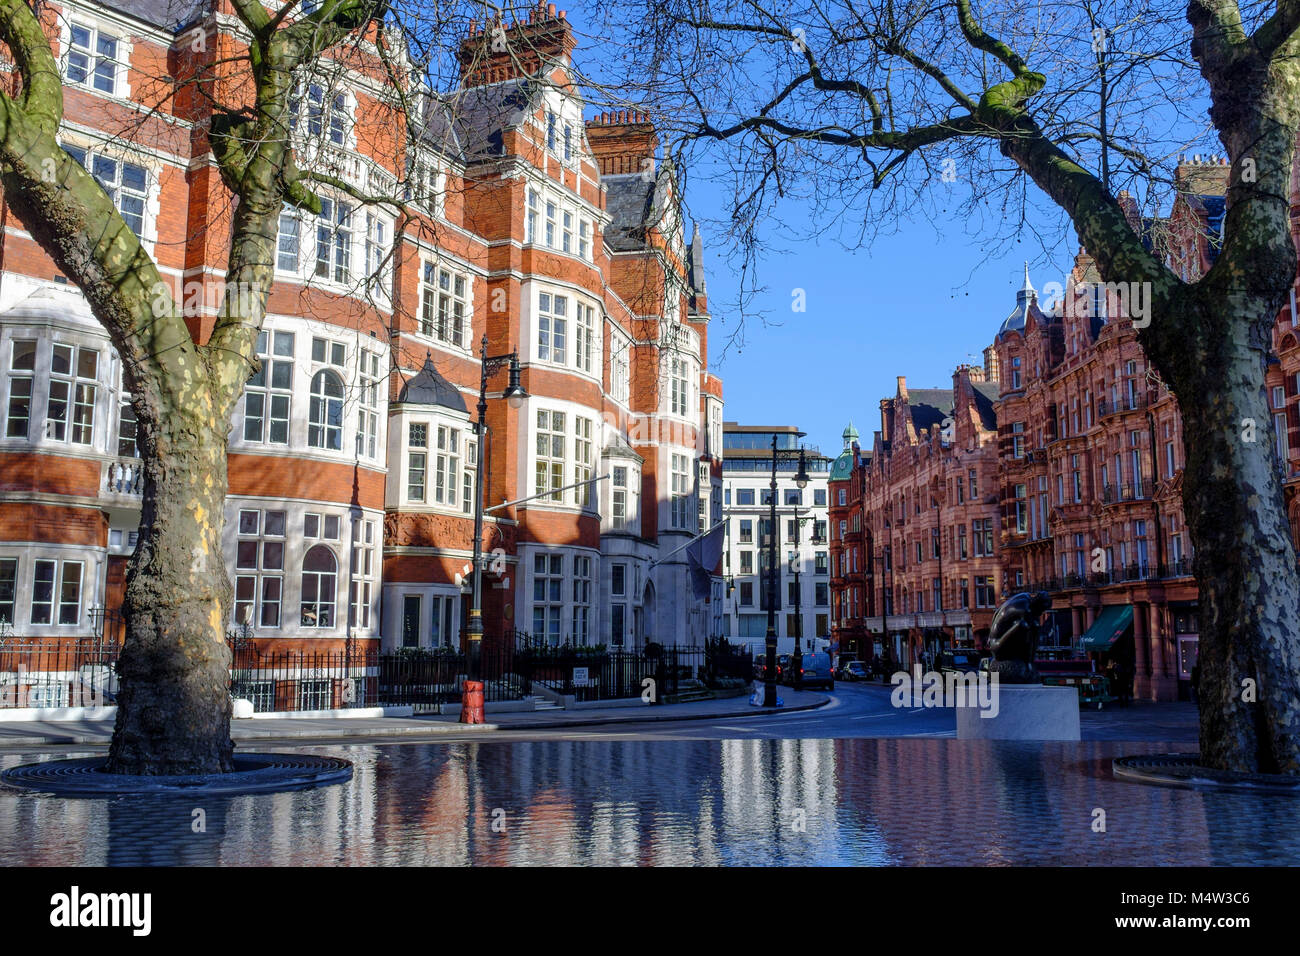 Carlos Place, Mayfair, London, UK - Stock Image